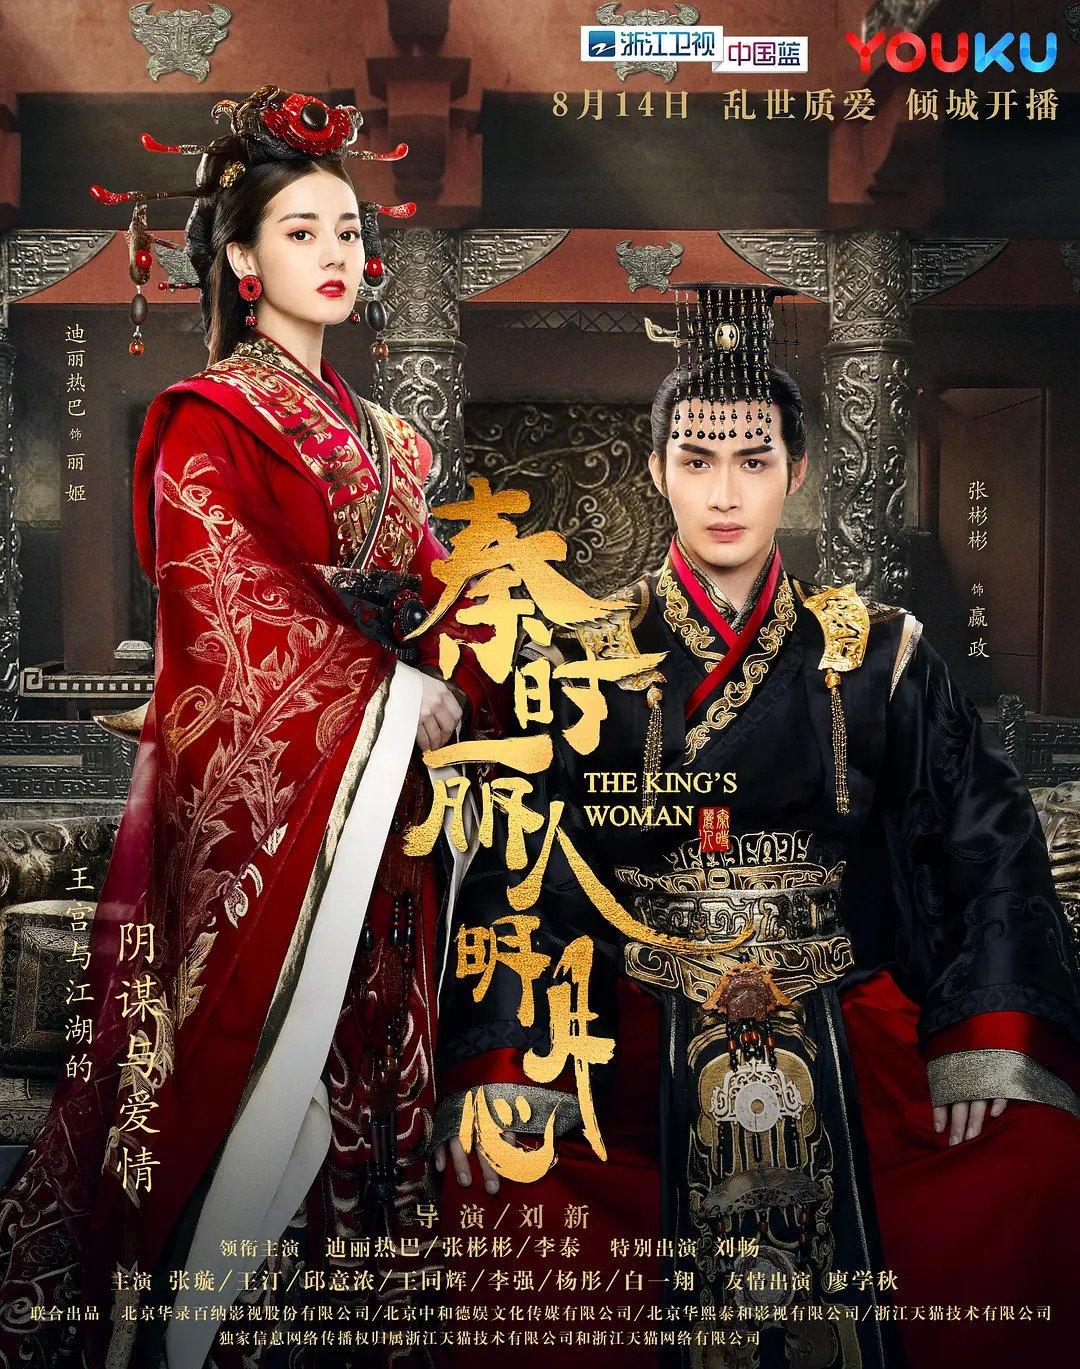 Drama storici cinesi - The King's Woman